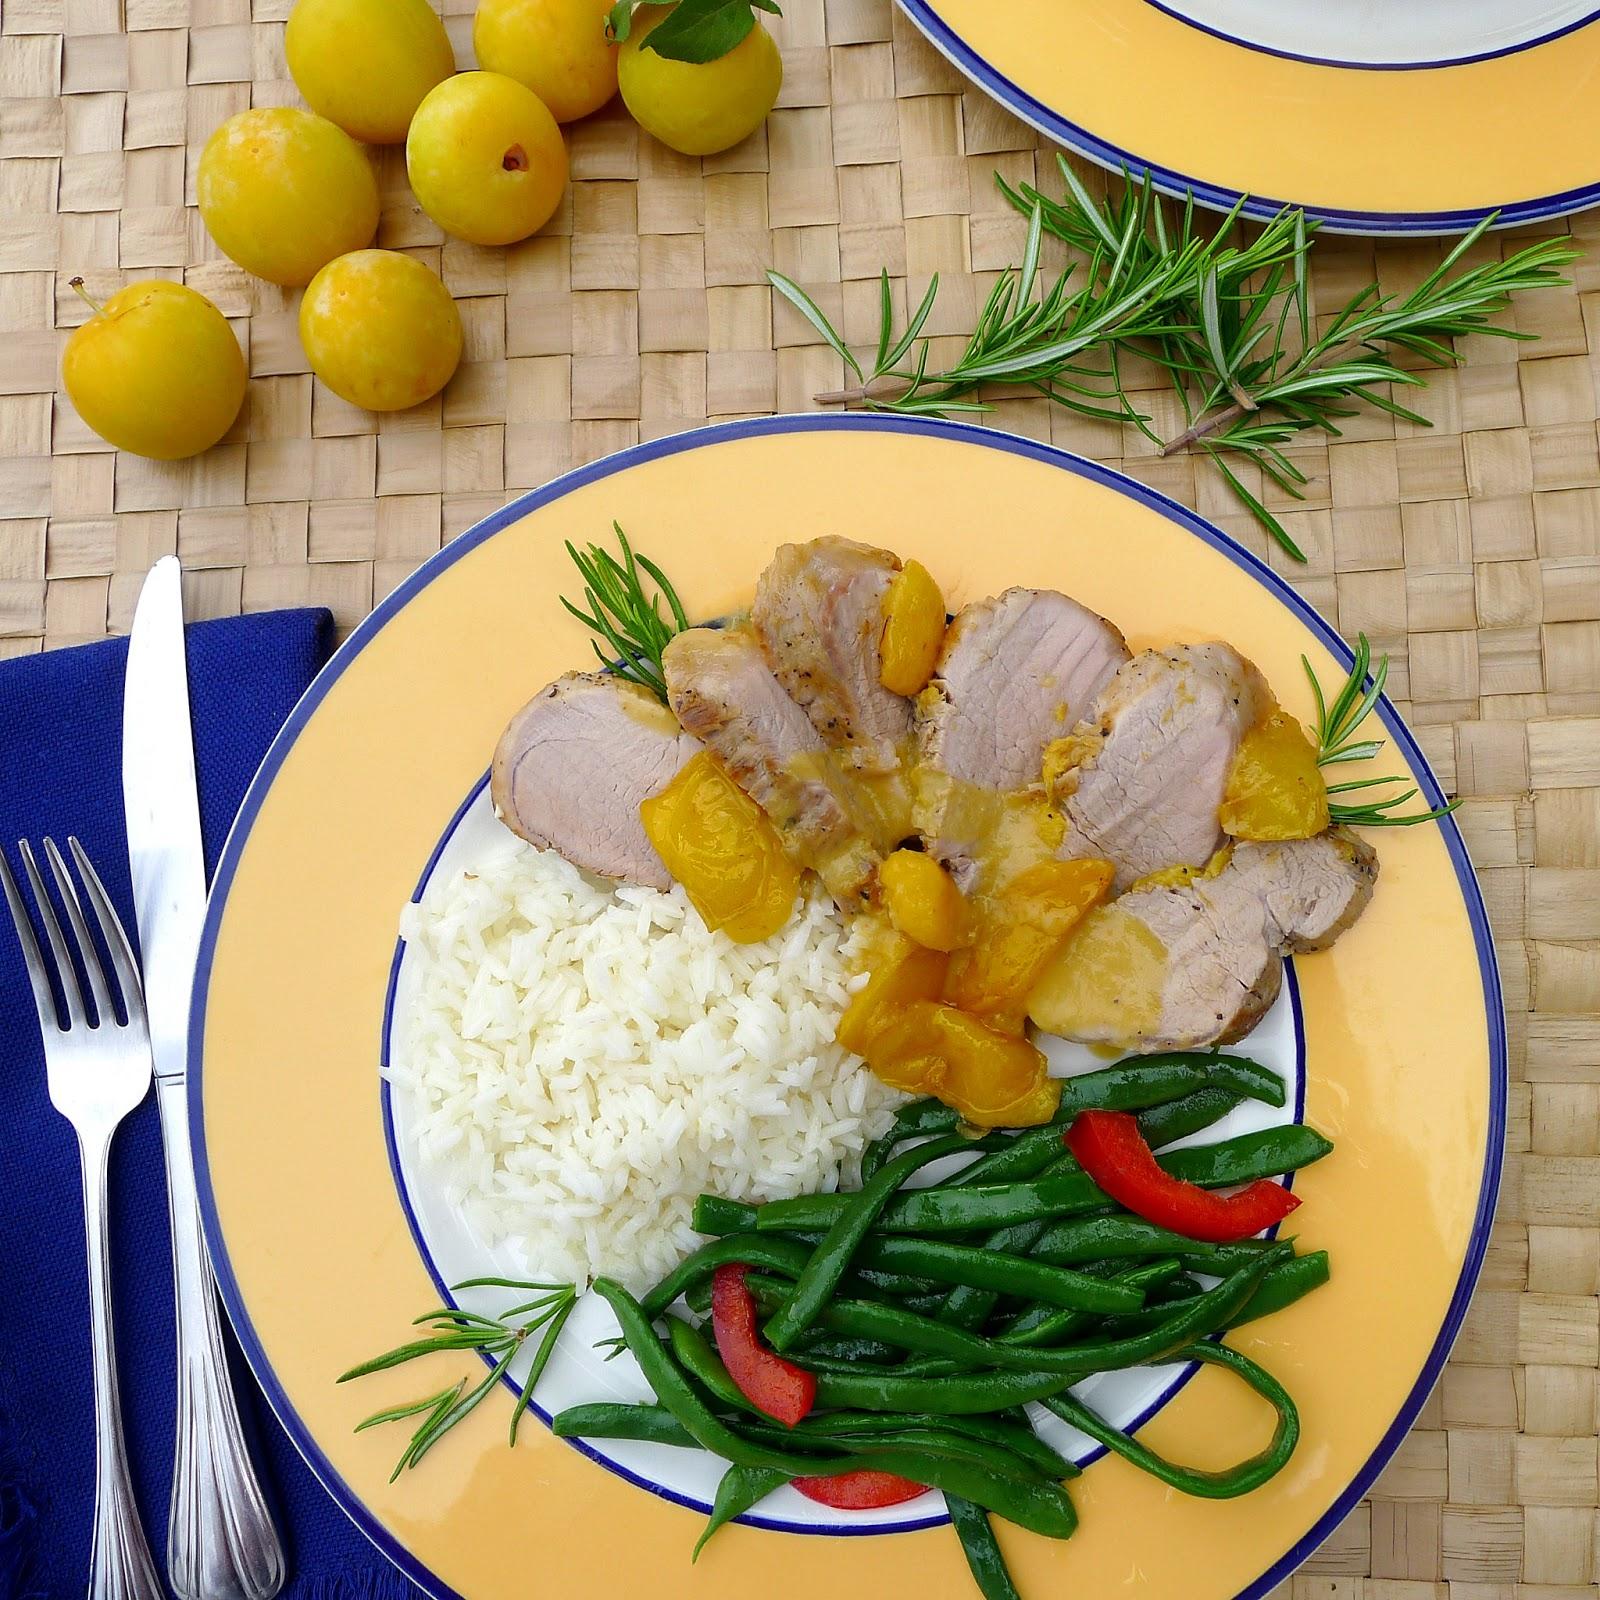 Plum sauce with rosemary complements pork tenderloin.